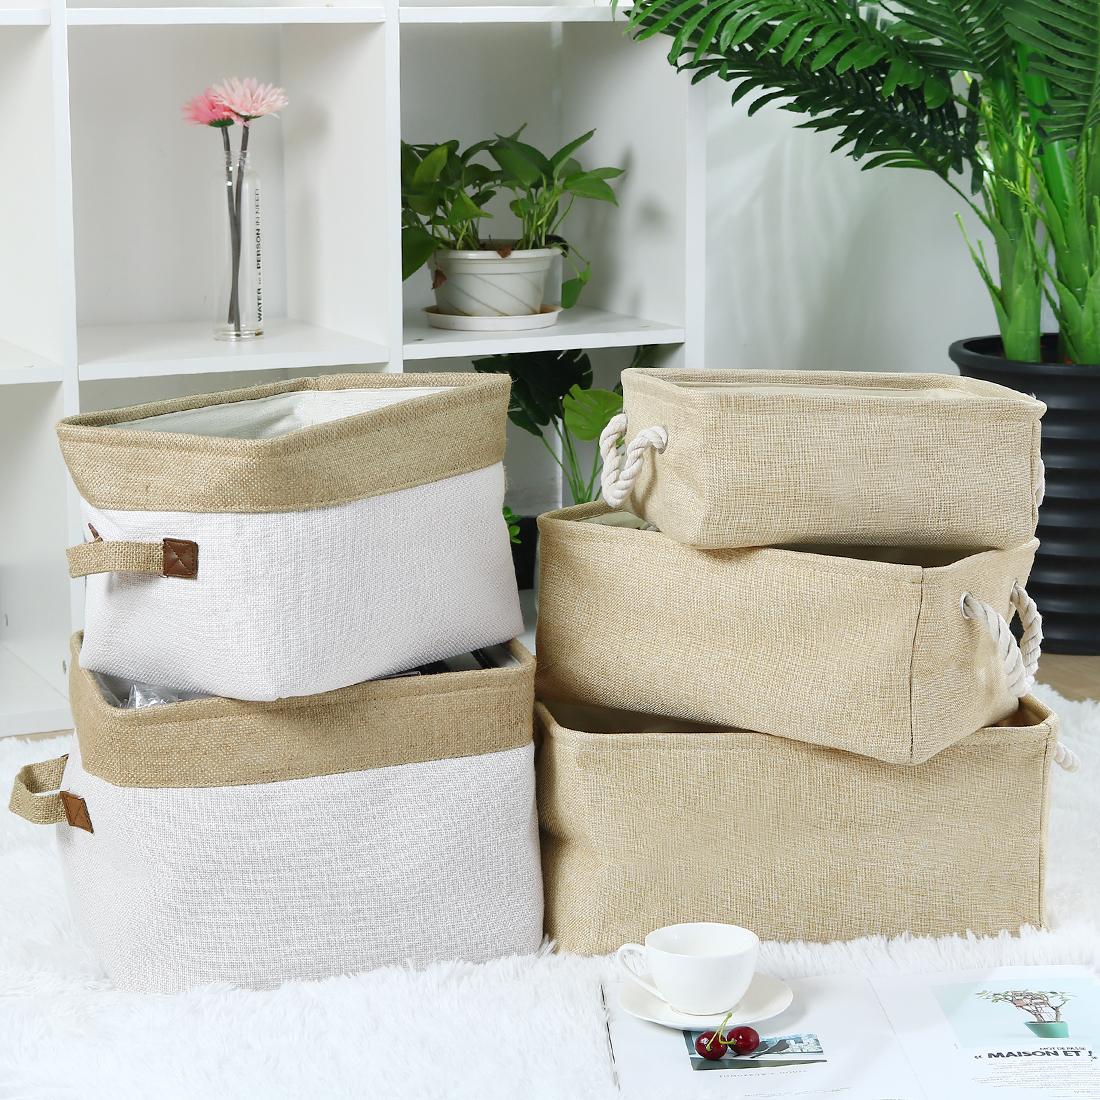 Home Fabric Storage Basket Bin w Dual Rope Handles for Laundry Khaki, Small - image 4 de 8